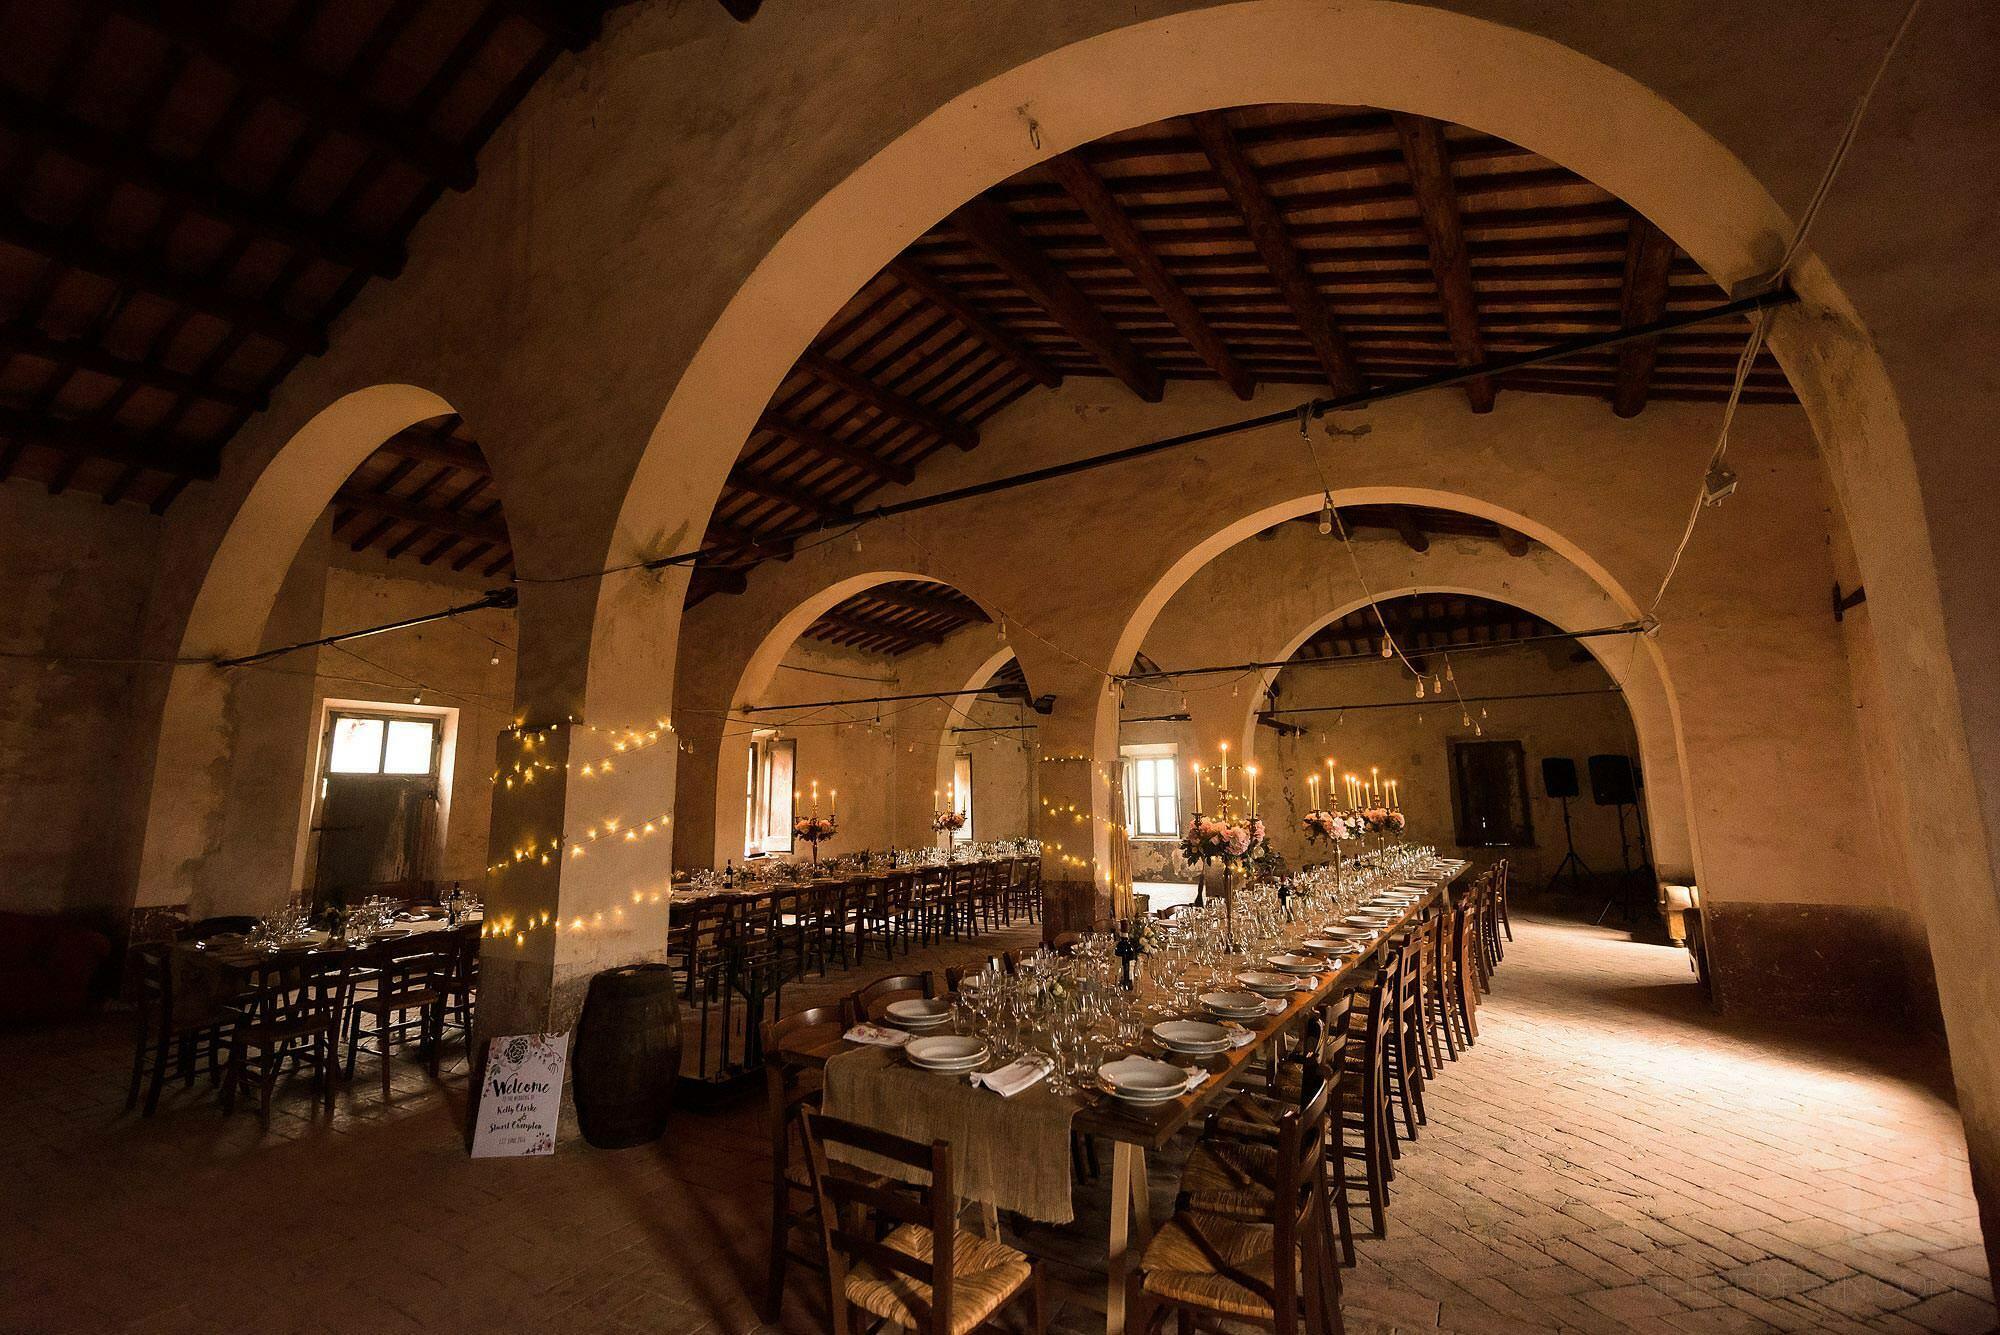 Montestigliano set up for wedding breakfast